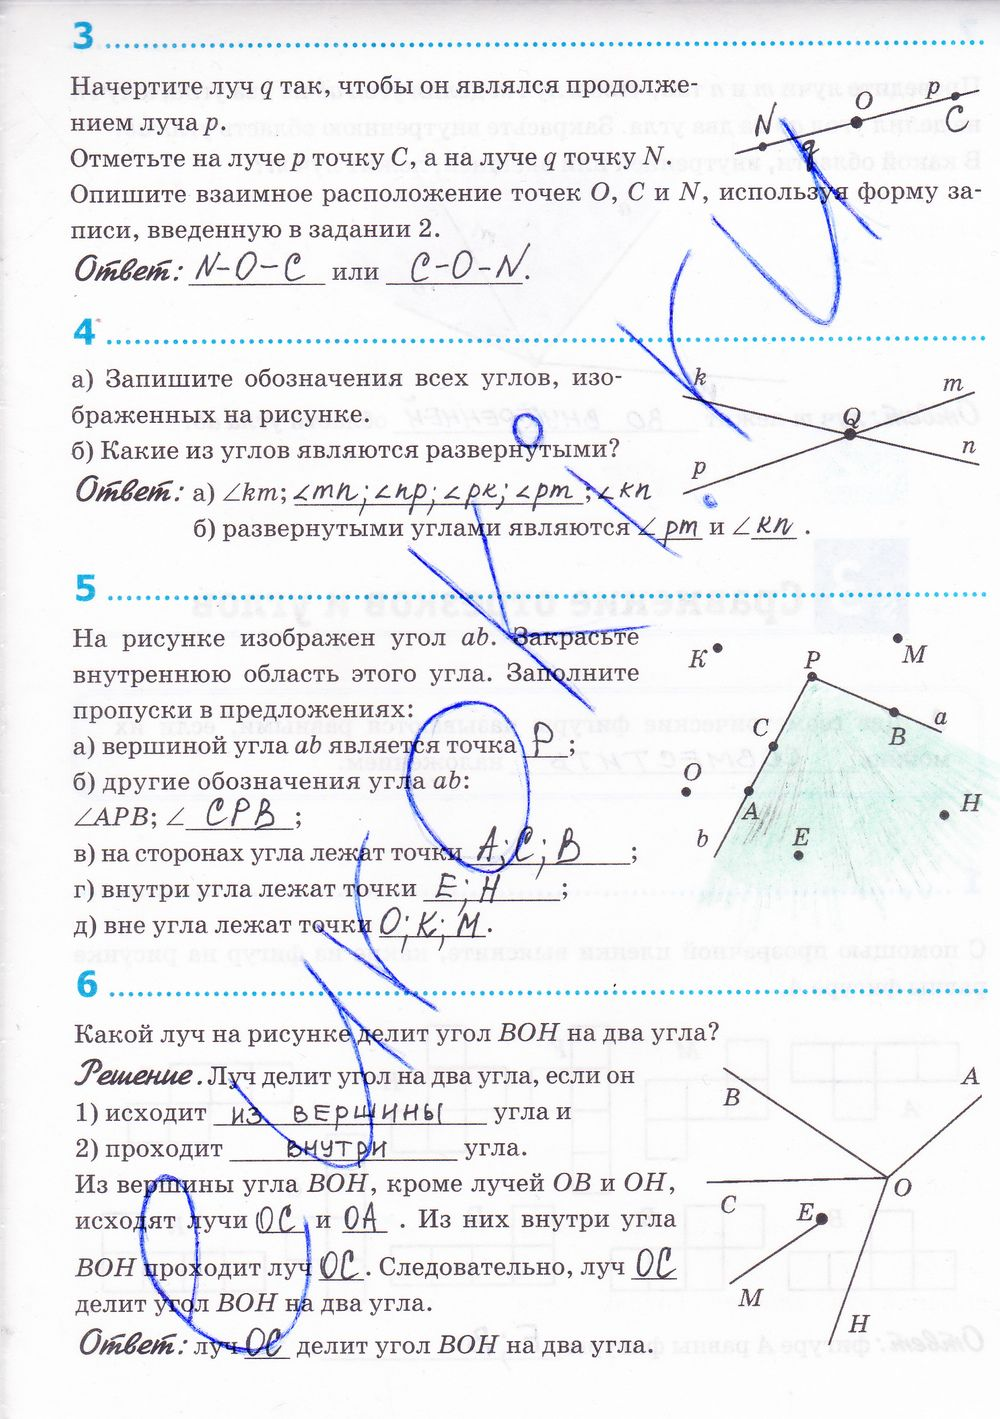 Онлайн гдз рабочая тетрадь по геометрии 7 класс атанасян торрент